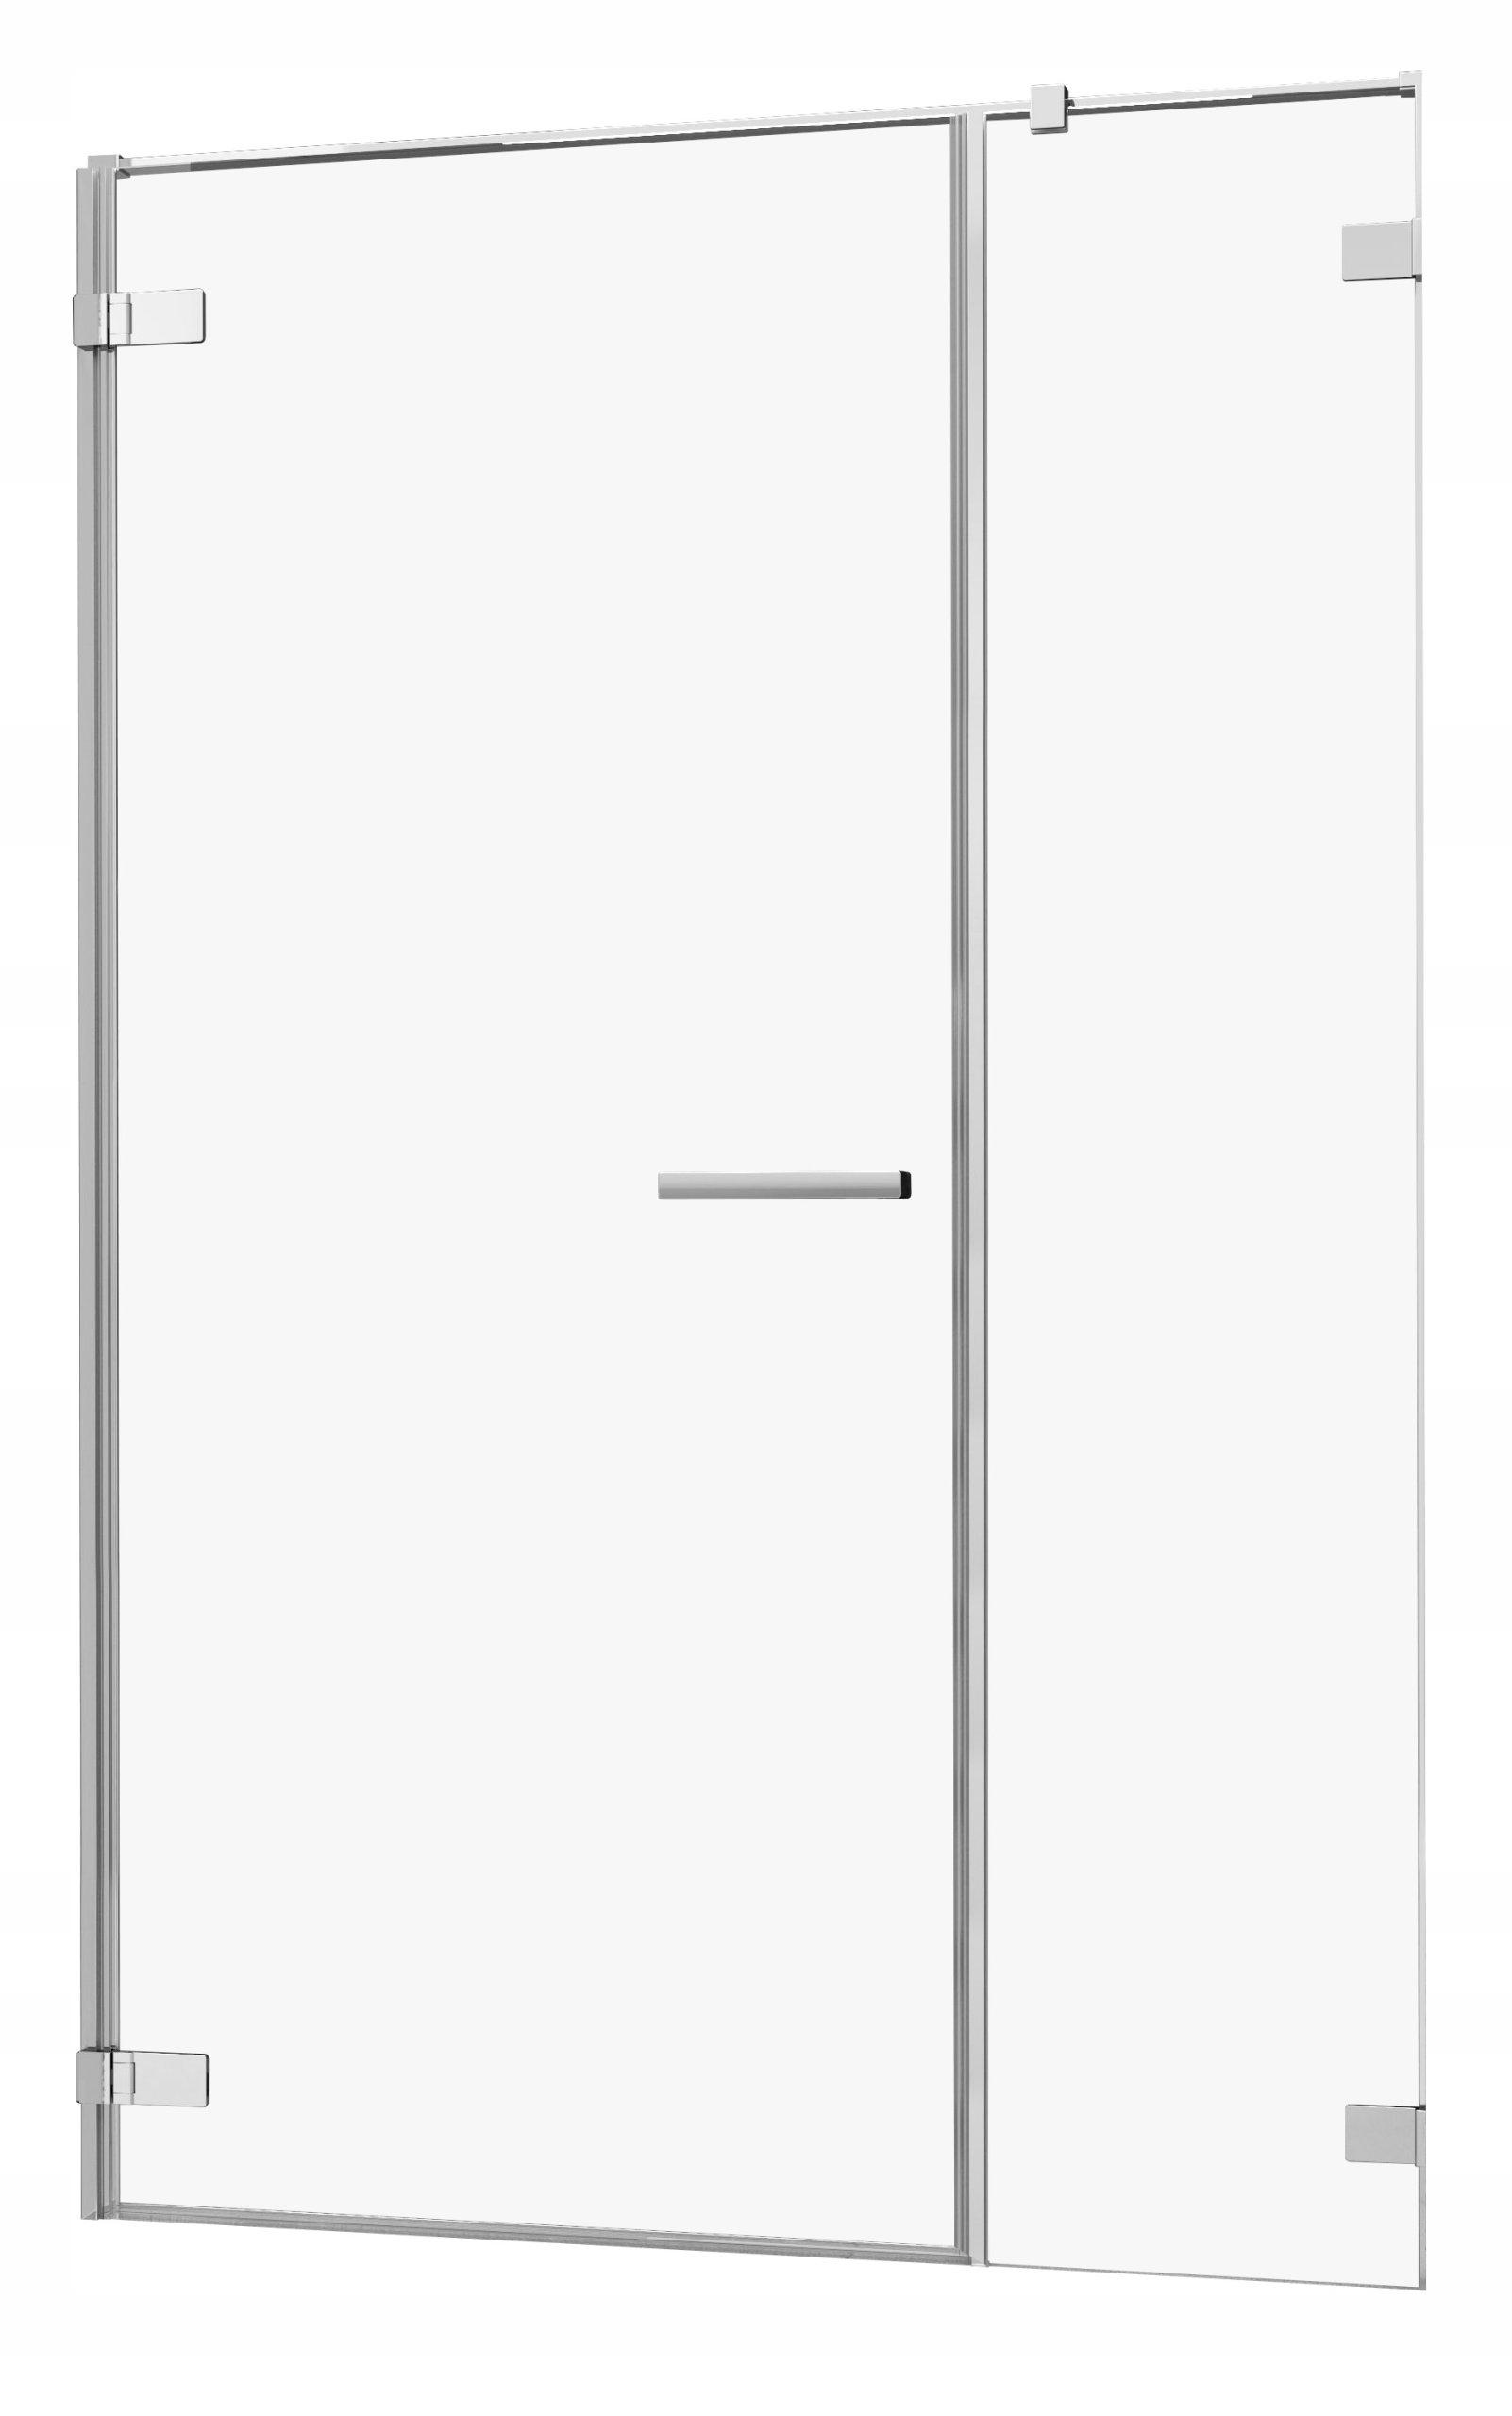 Sprchové dvere Arta DWS 140x200 RADAWAY